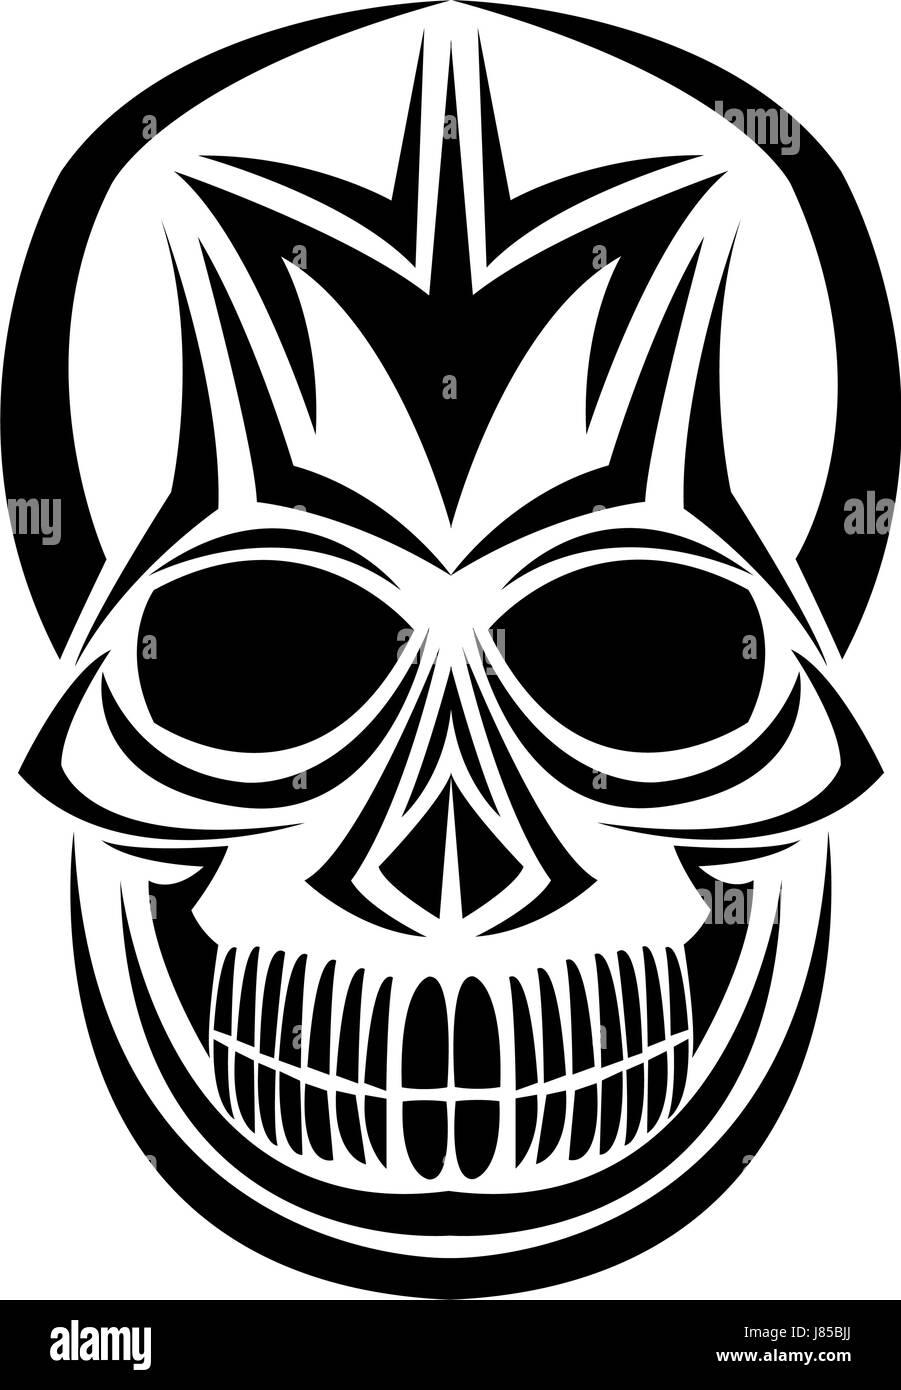 skull tribal tattoo bohemian decoration image - Stock Image